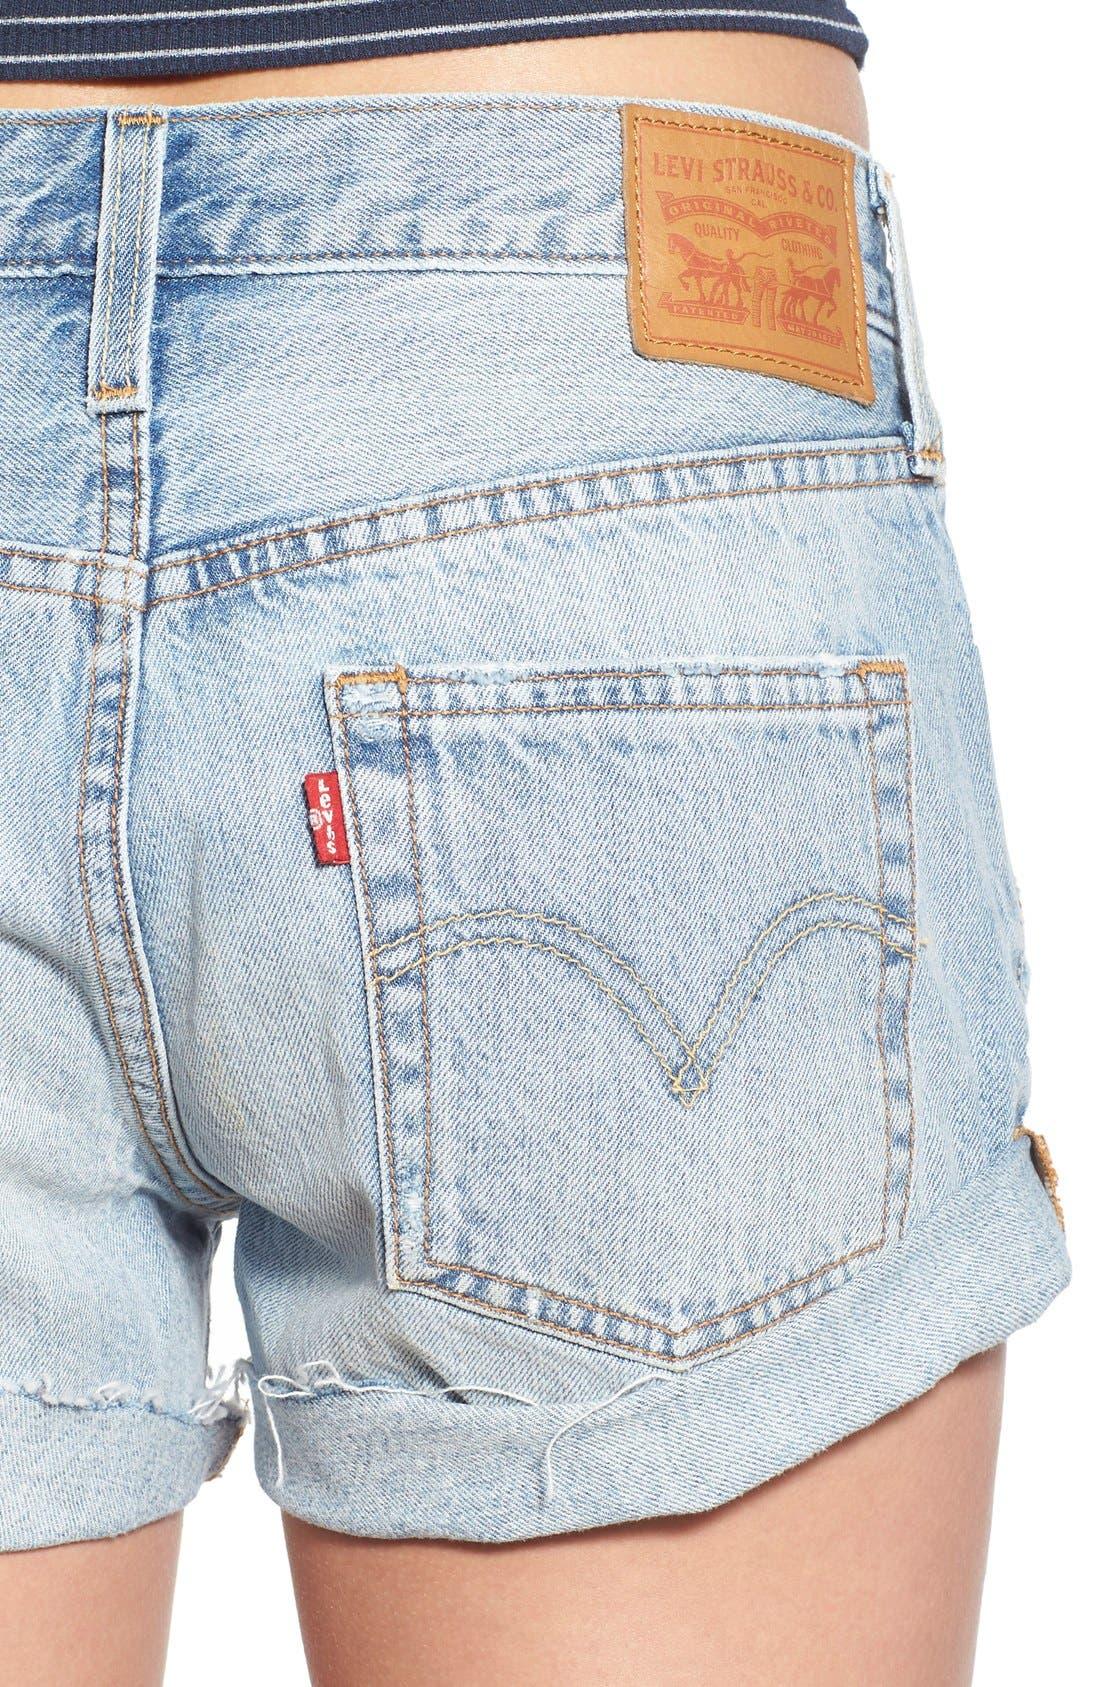 Alternate Image 4  - Levi's® '501® Customized' Distressed Rolled Denim Shorts